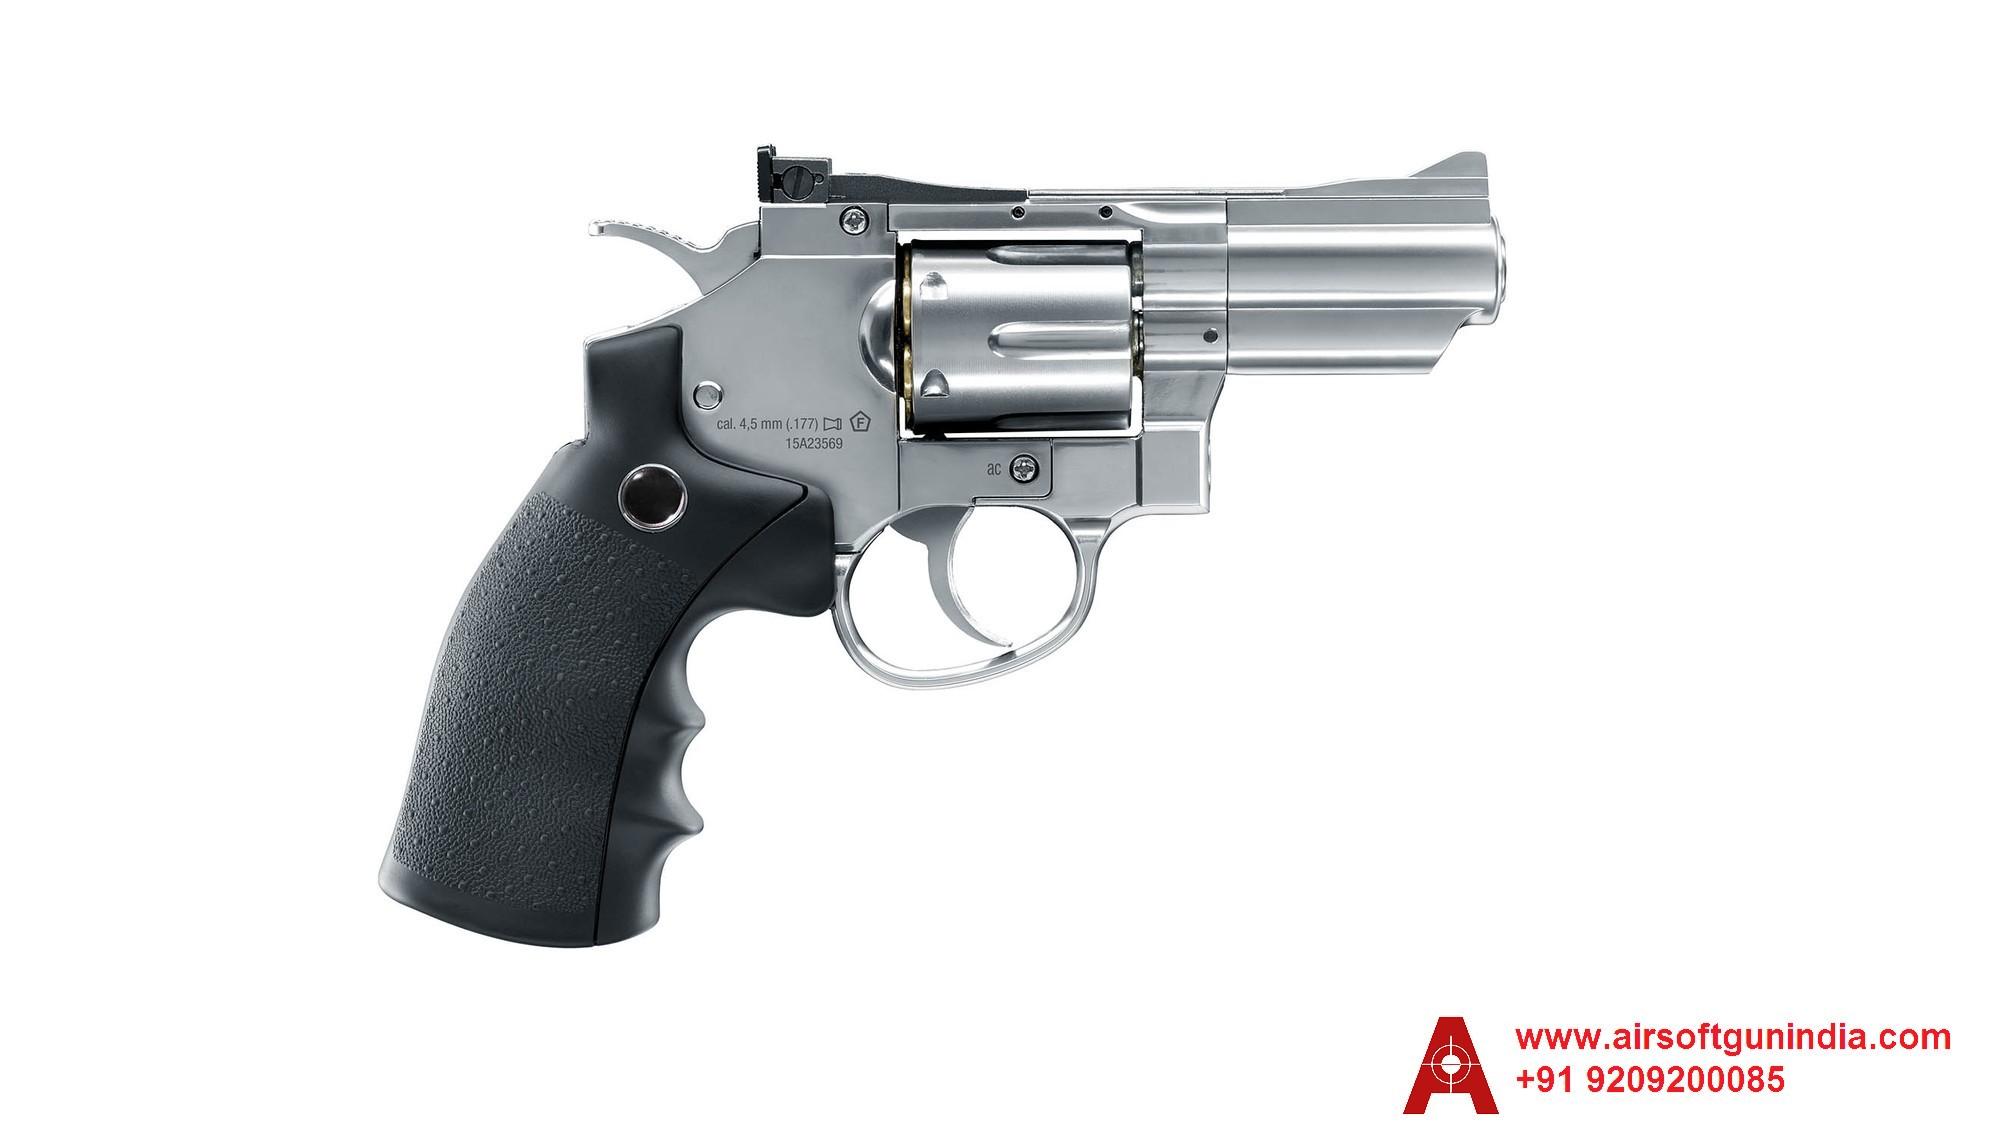 Legends S25 2.5 Inch  Pellet Revolver .177 Caliber By Airsoft Gun India